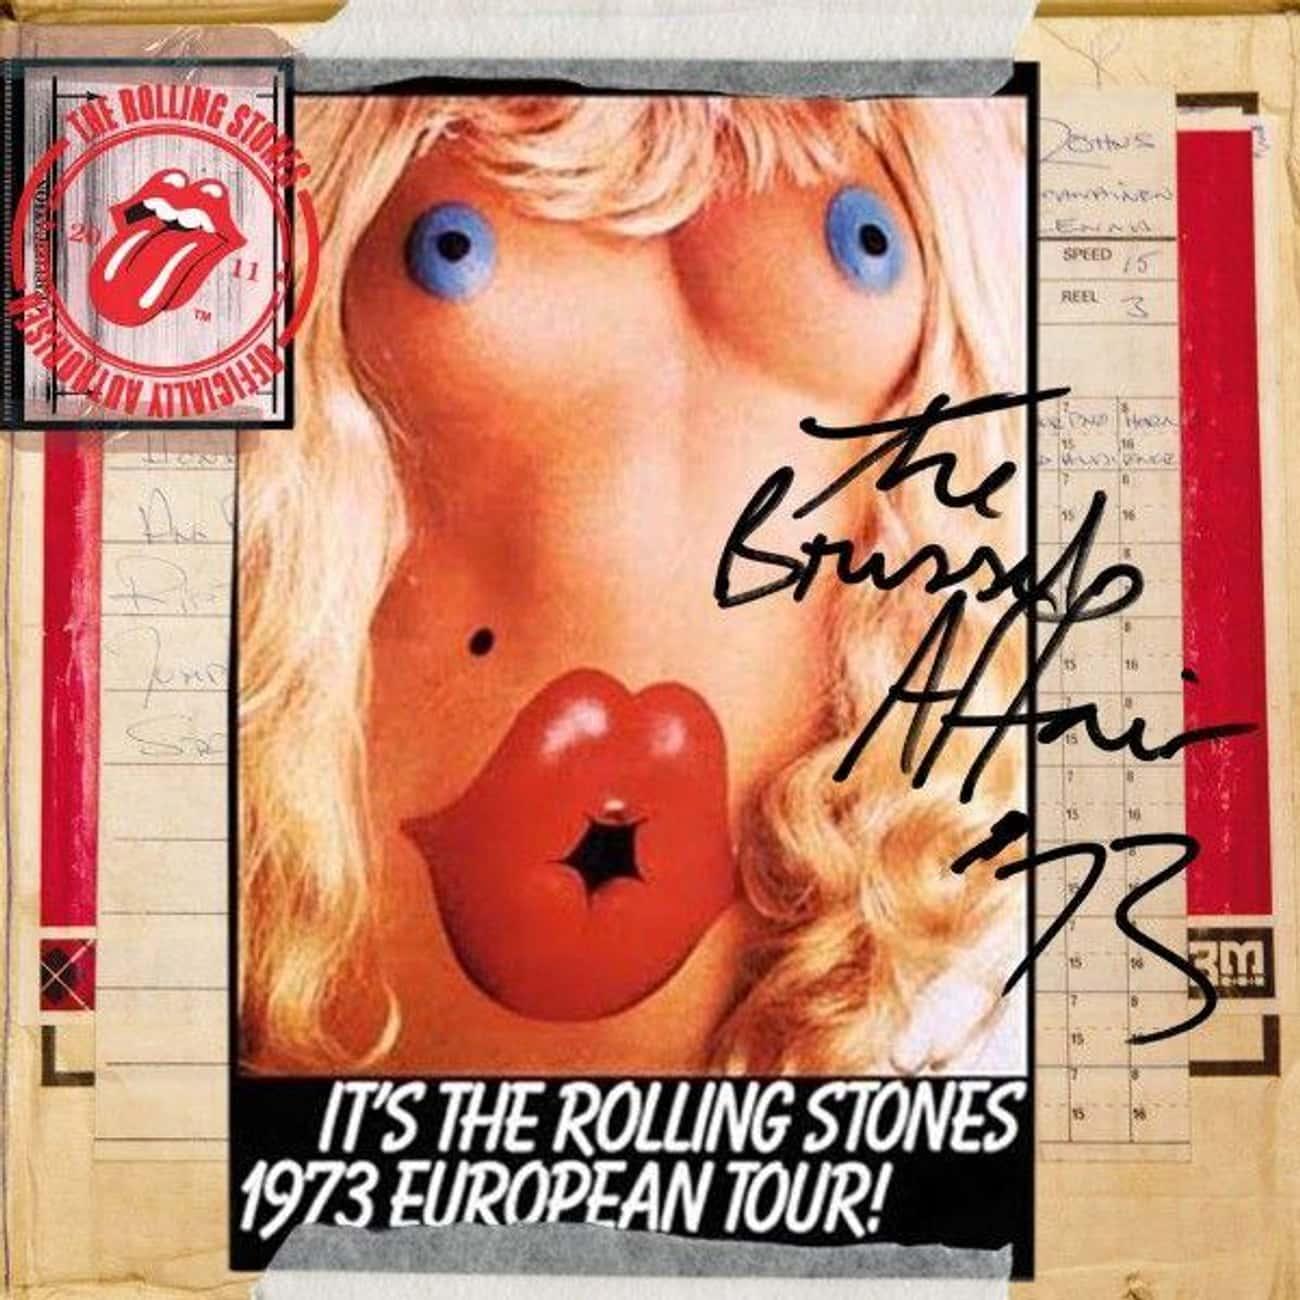 Brussels Affair Live 1973